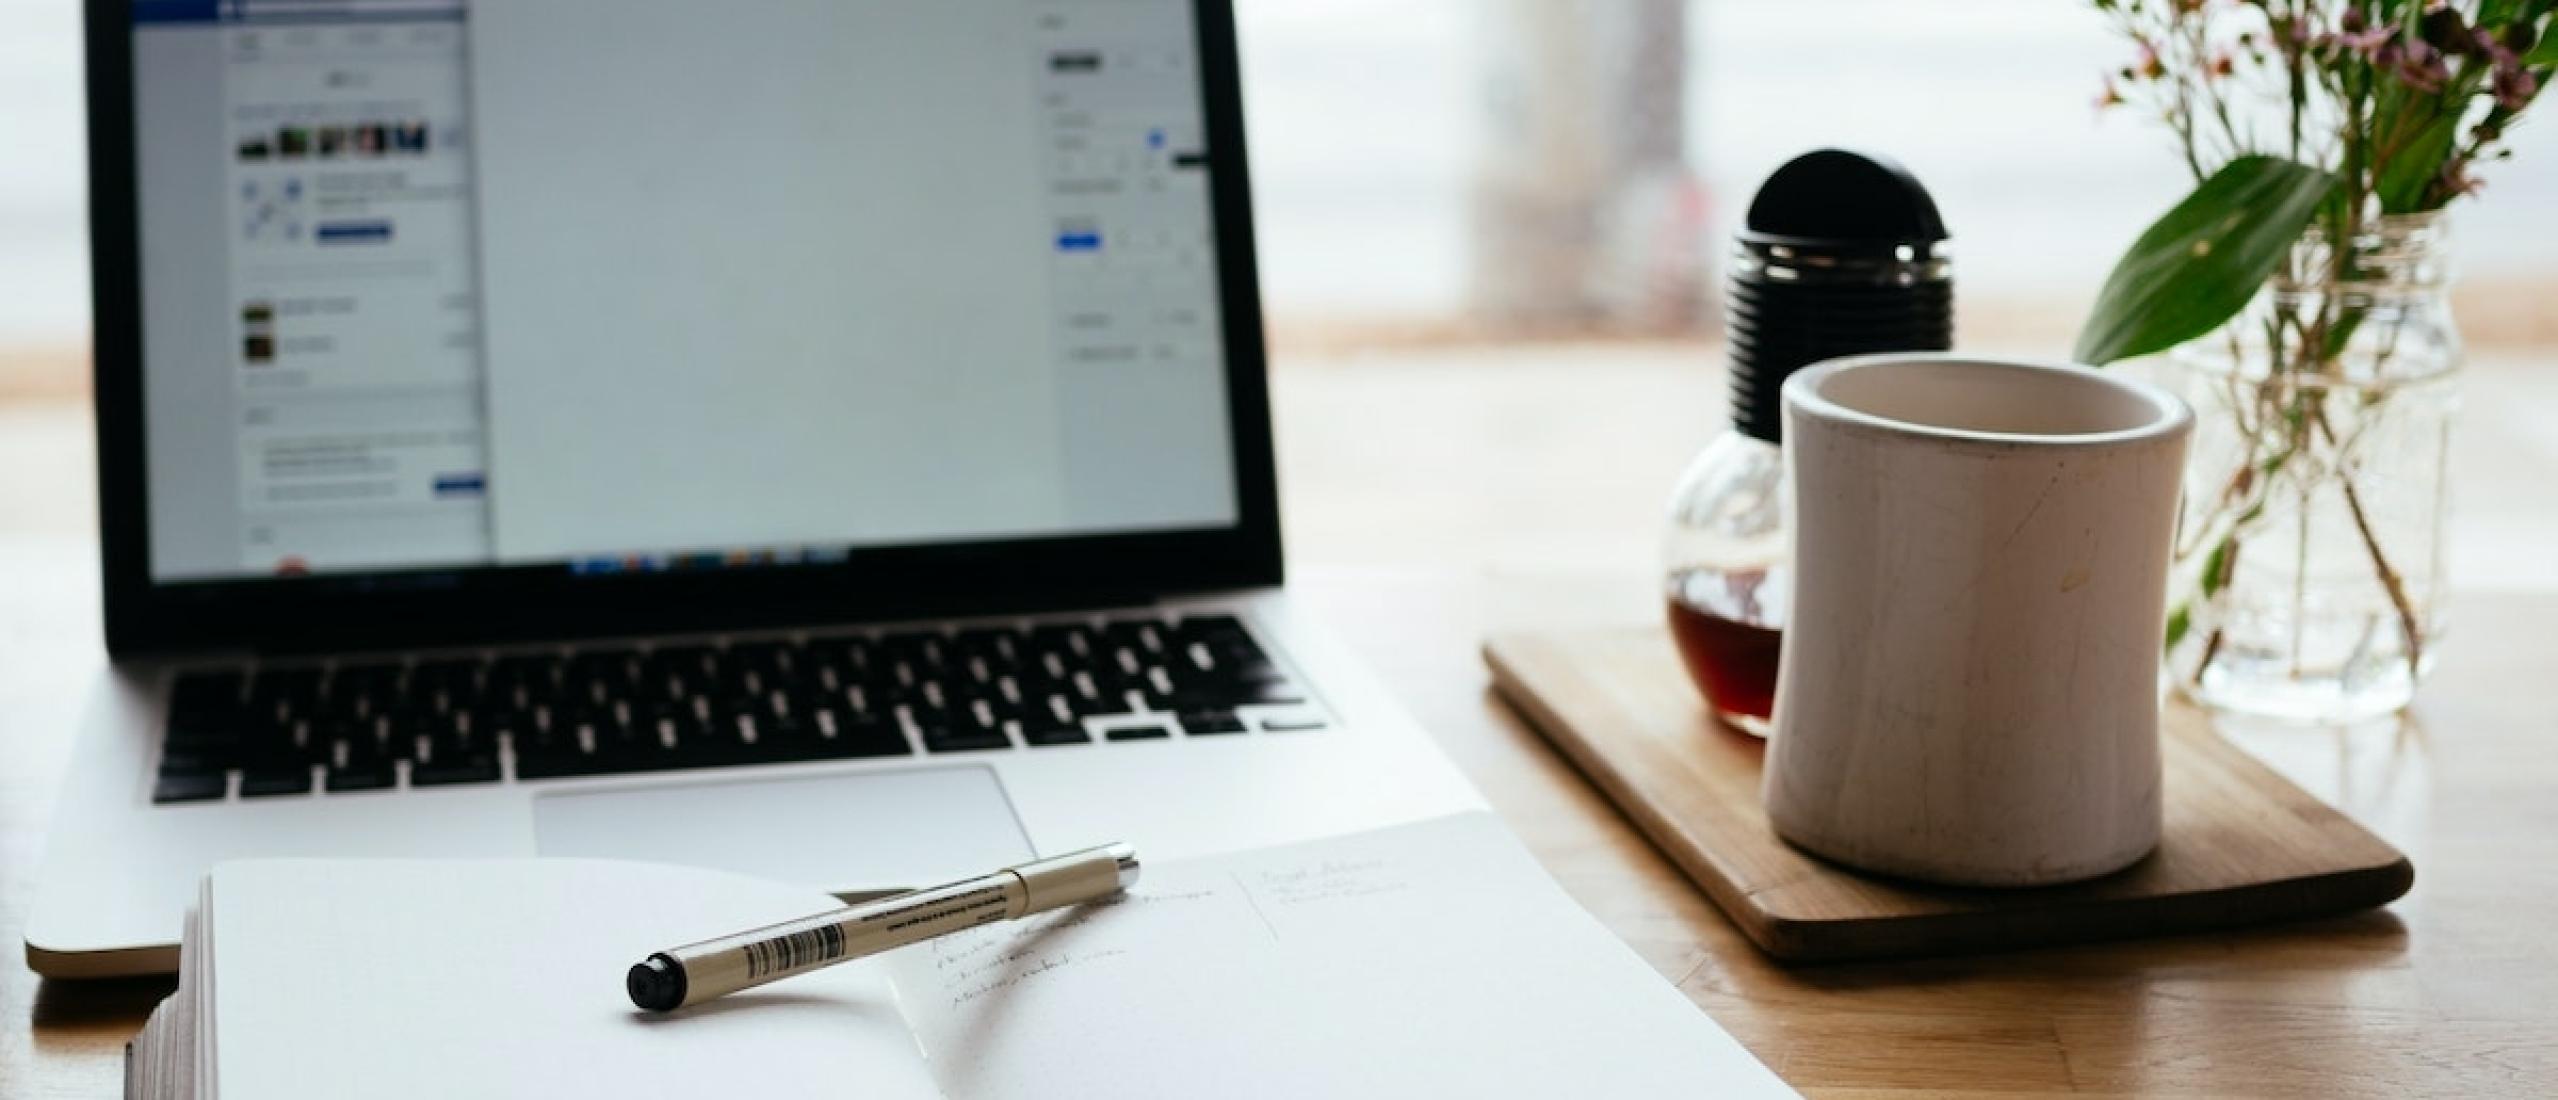 Online cursus maken, hoe doe je dat?